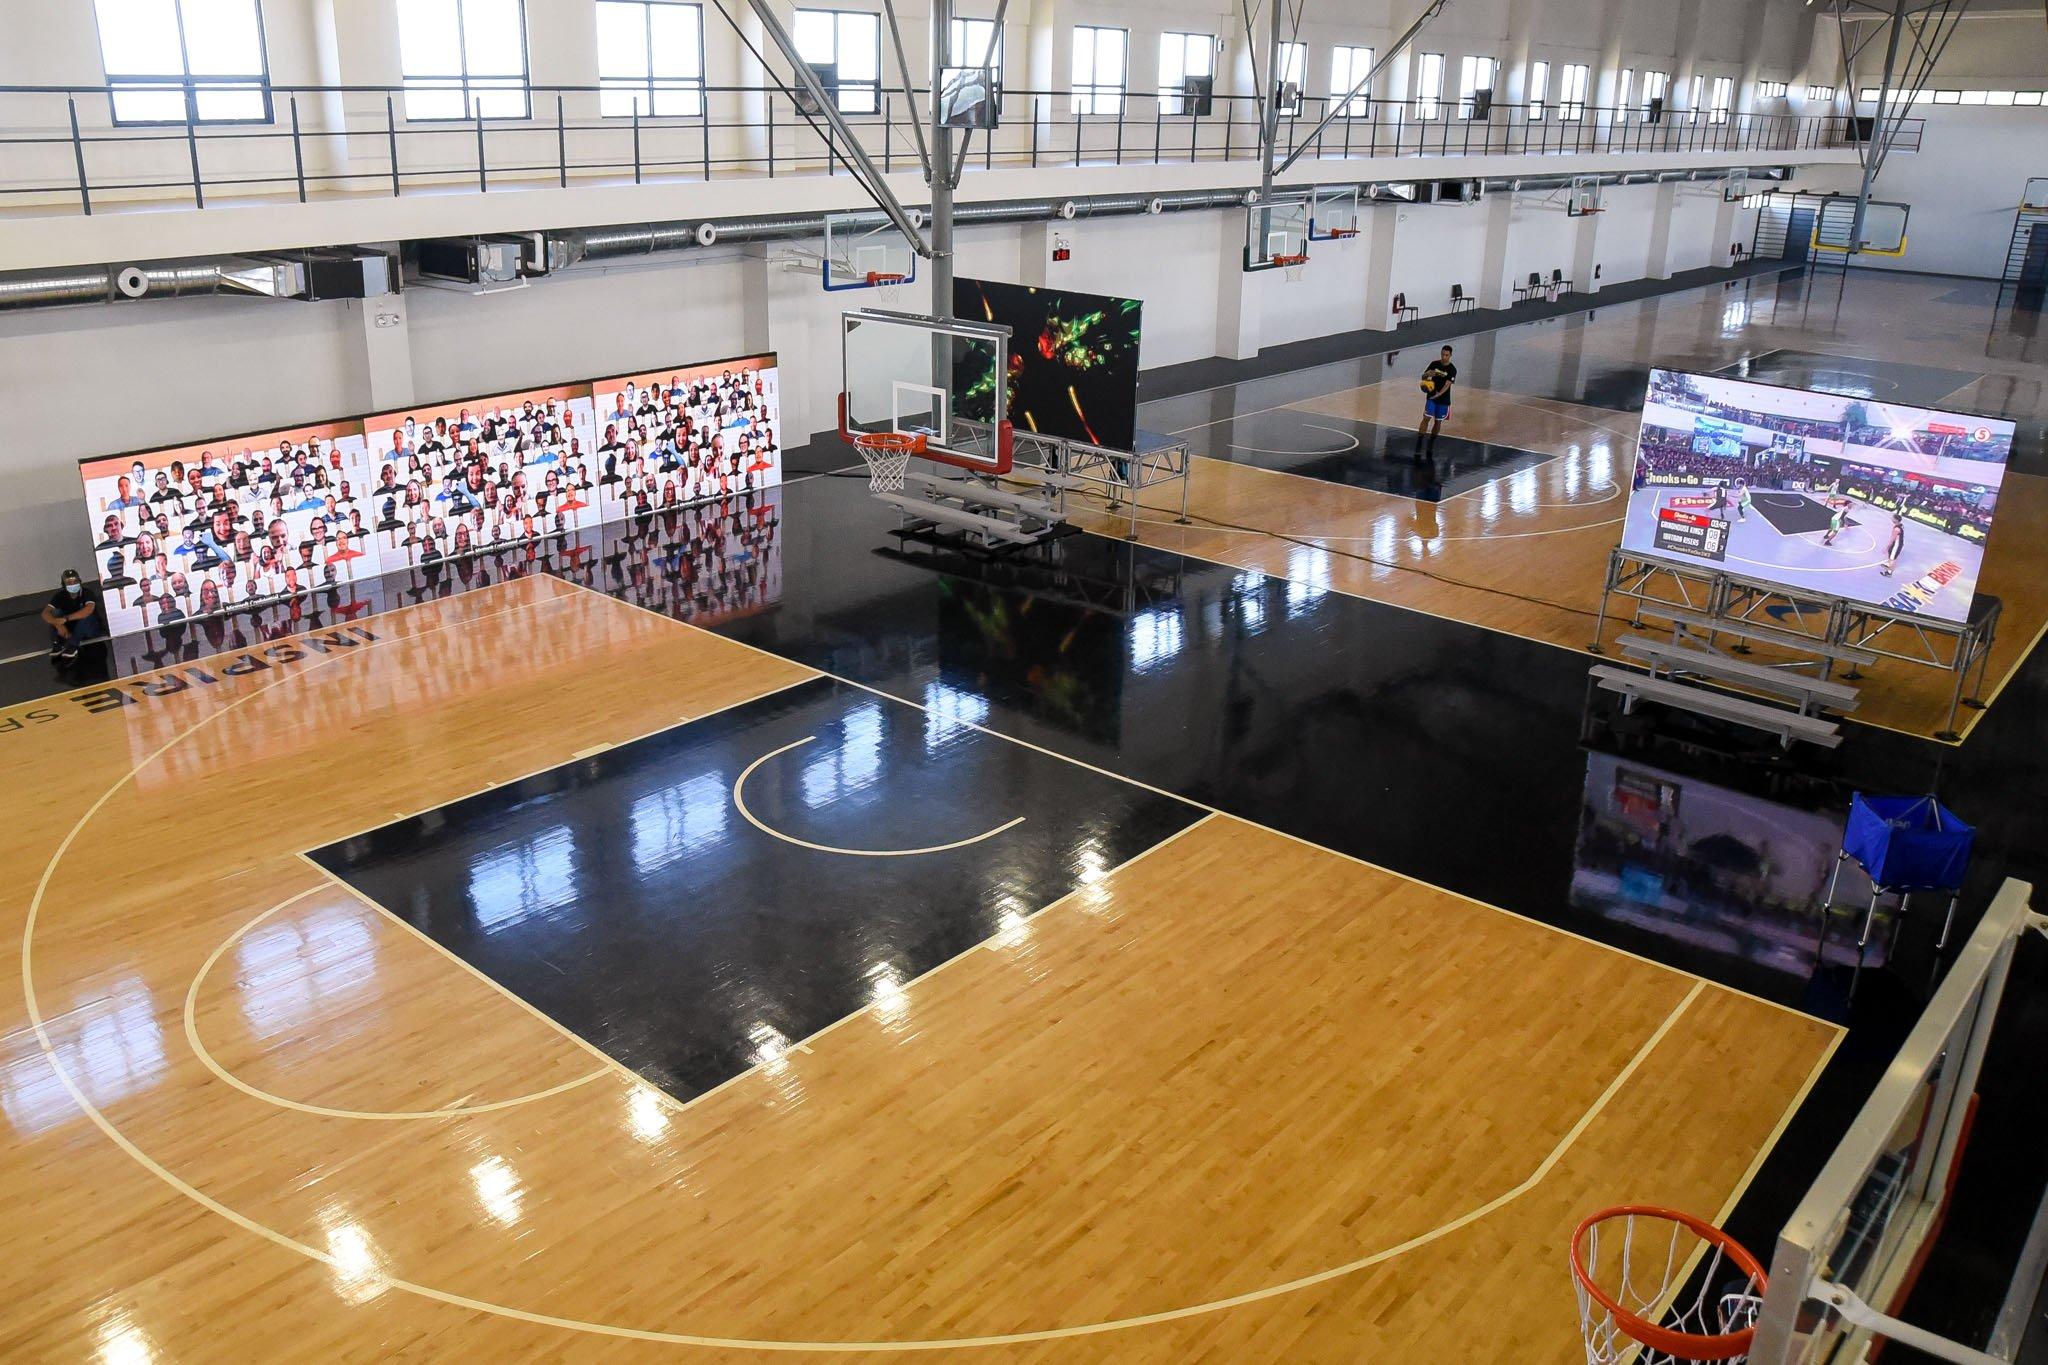 Tiebreaker Times Chooks 3x3 to move to full bubble set-up after IATF denial 3x3 Basketball Chooks-to-Go Pilipinas 3x3 News  Ronald Mascarinas Coronavirus Pandemic 2020 Chooks-to-Go President's Cup 2020 Chooks-to-Go Pilipinas 3x3 Season